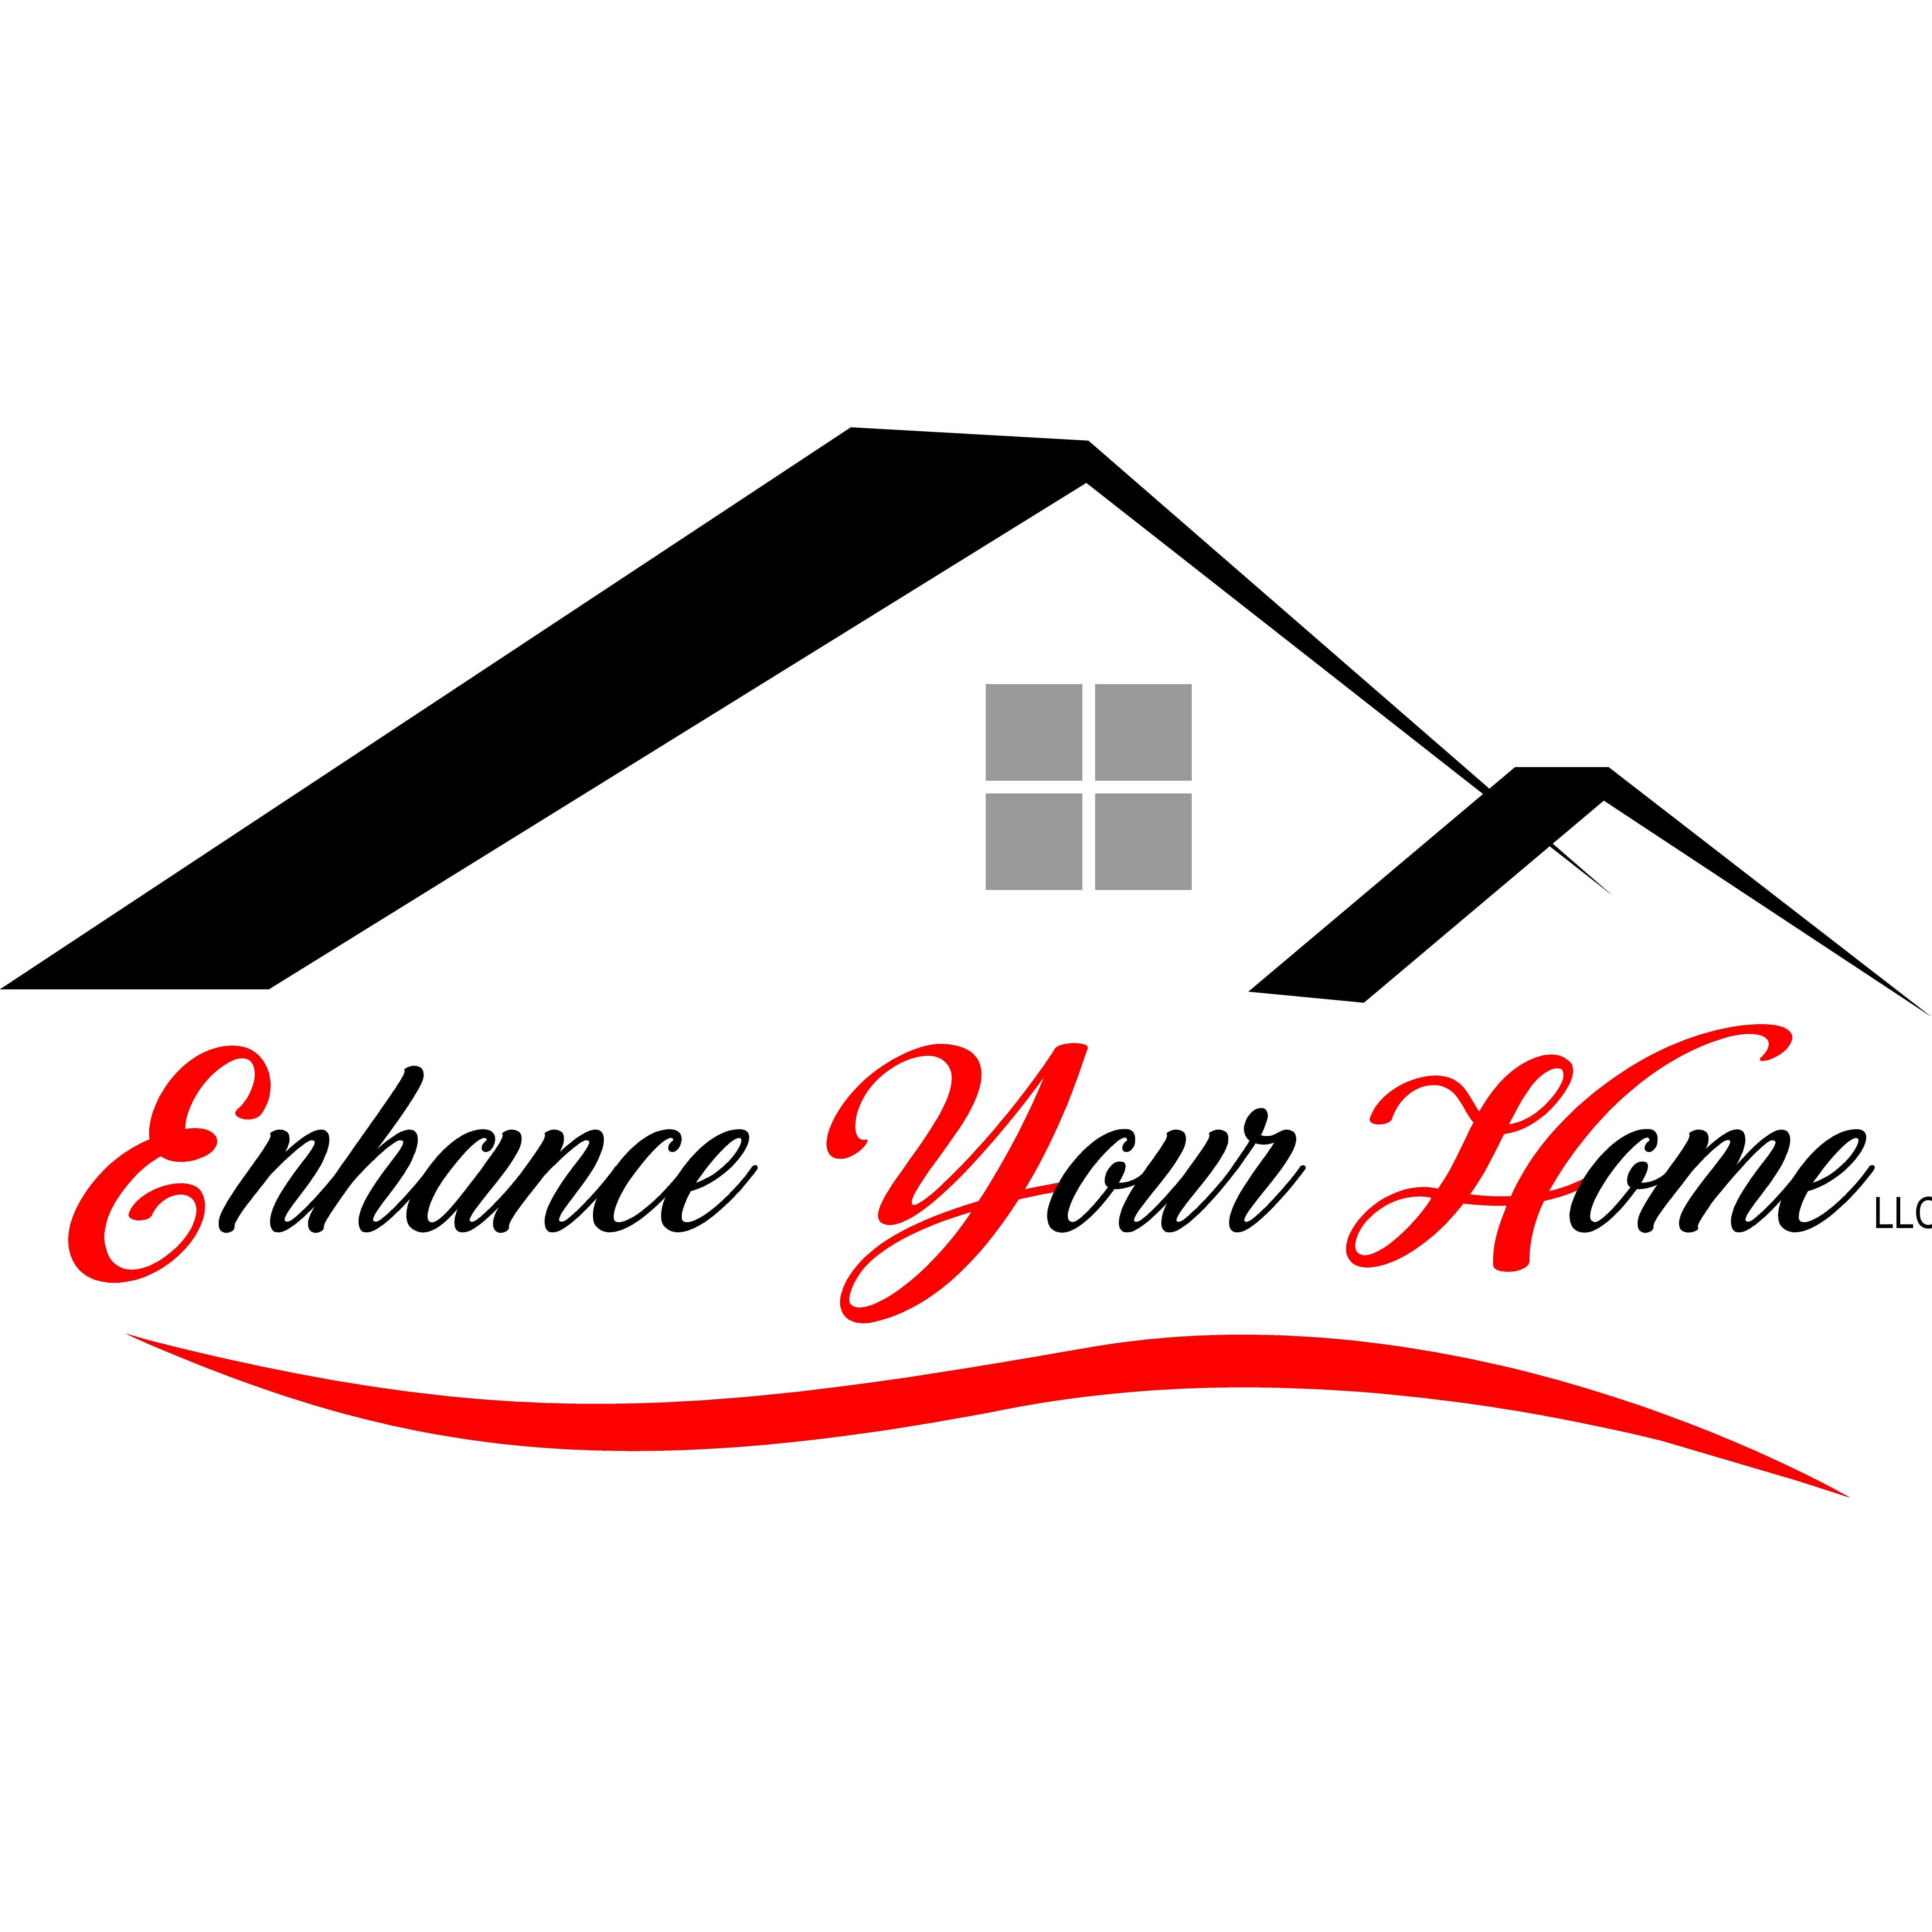 Enhance Your Home LLC